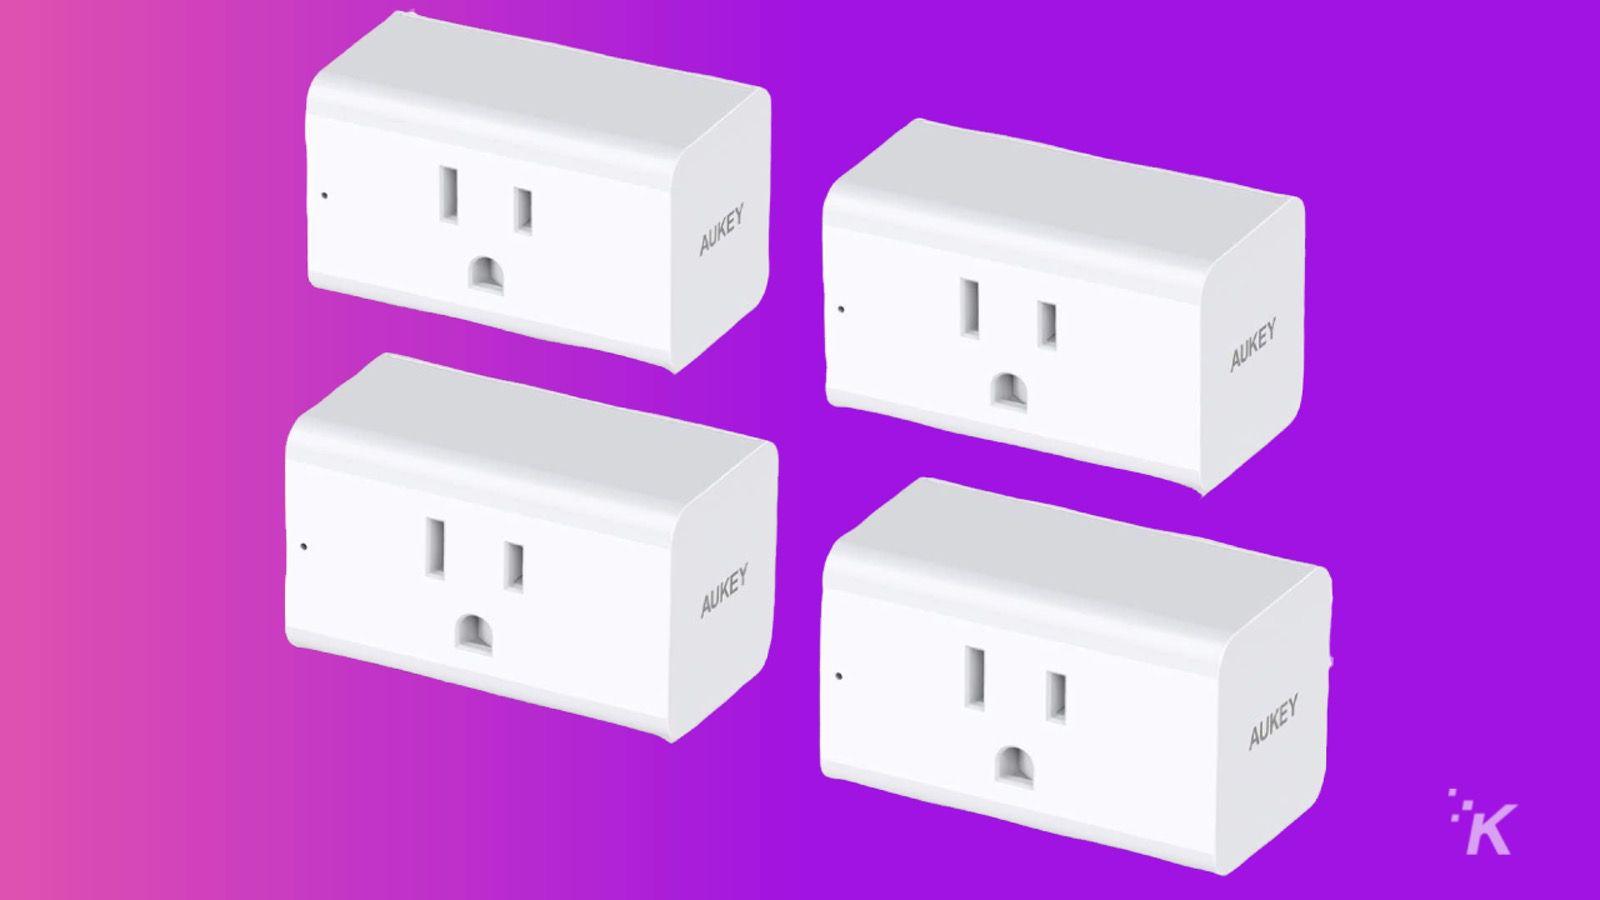 aukey smart plugs